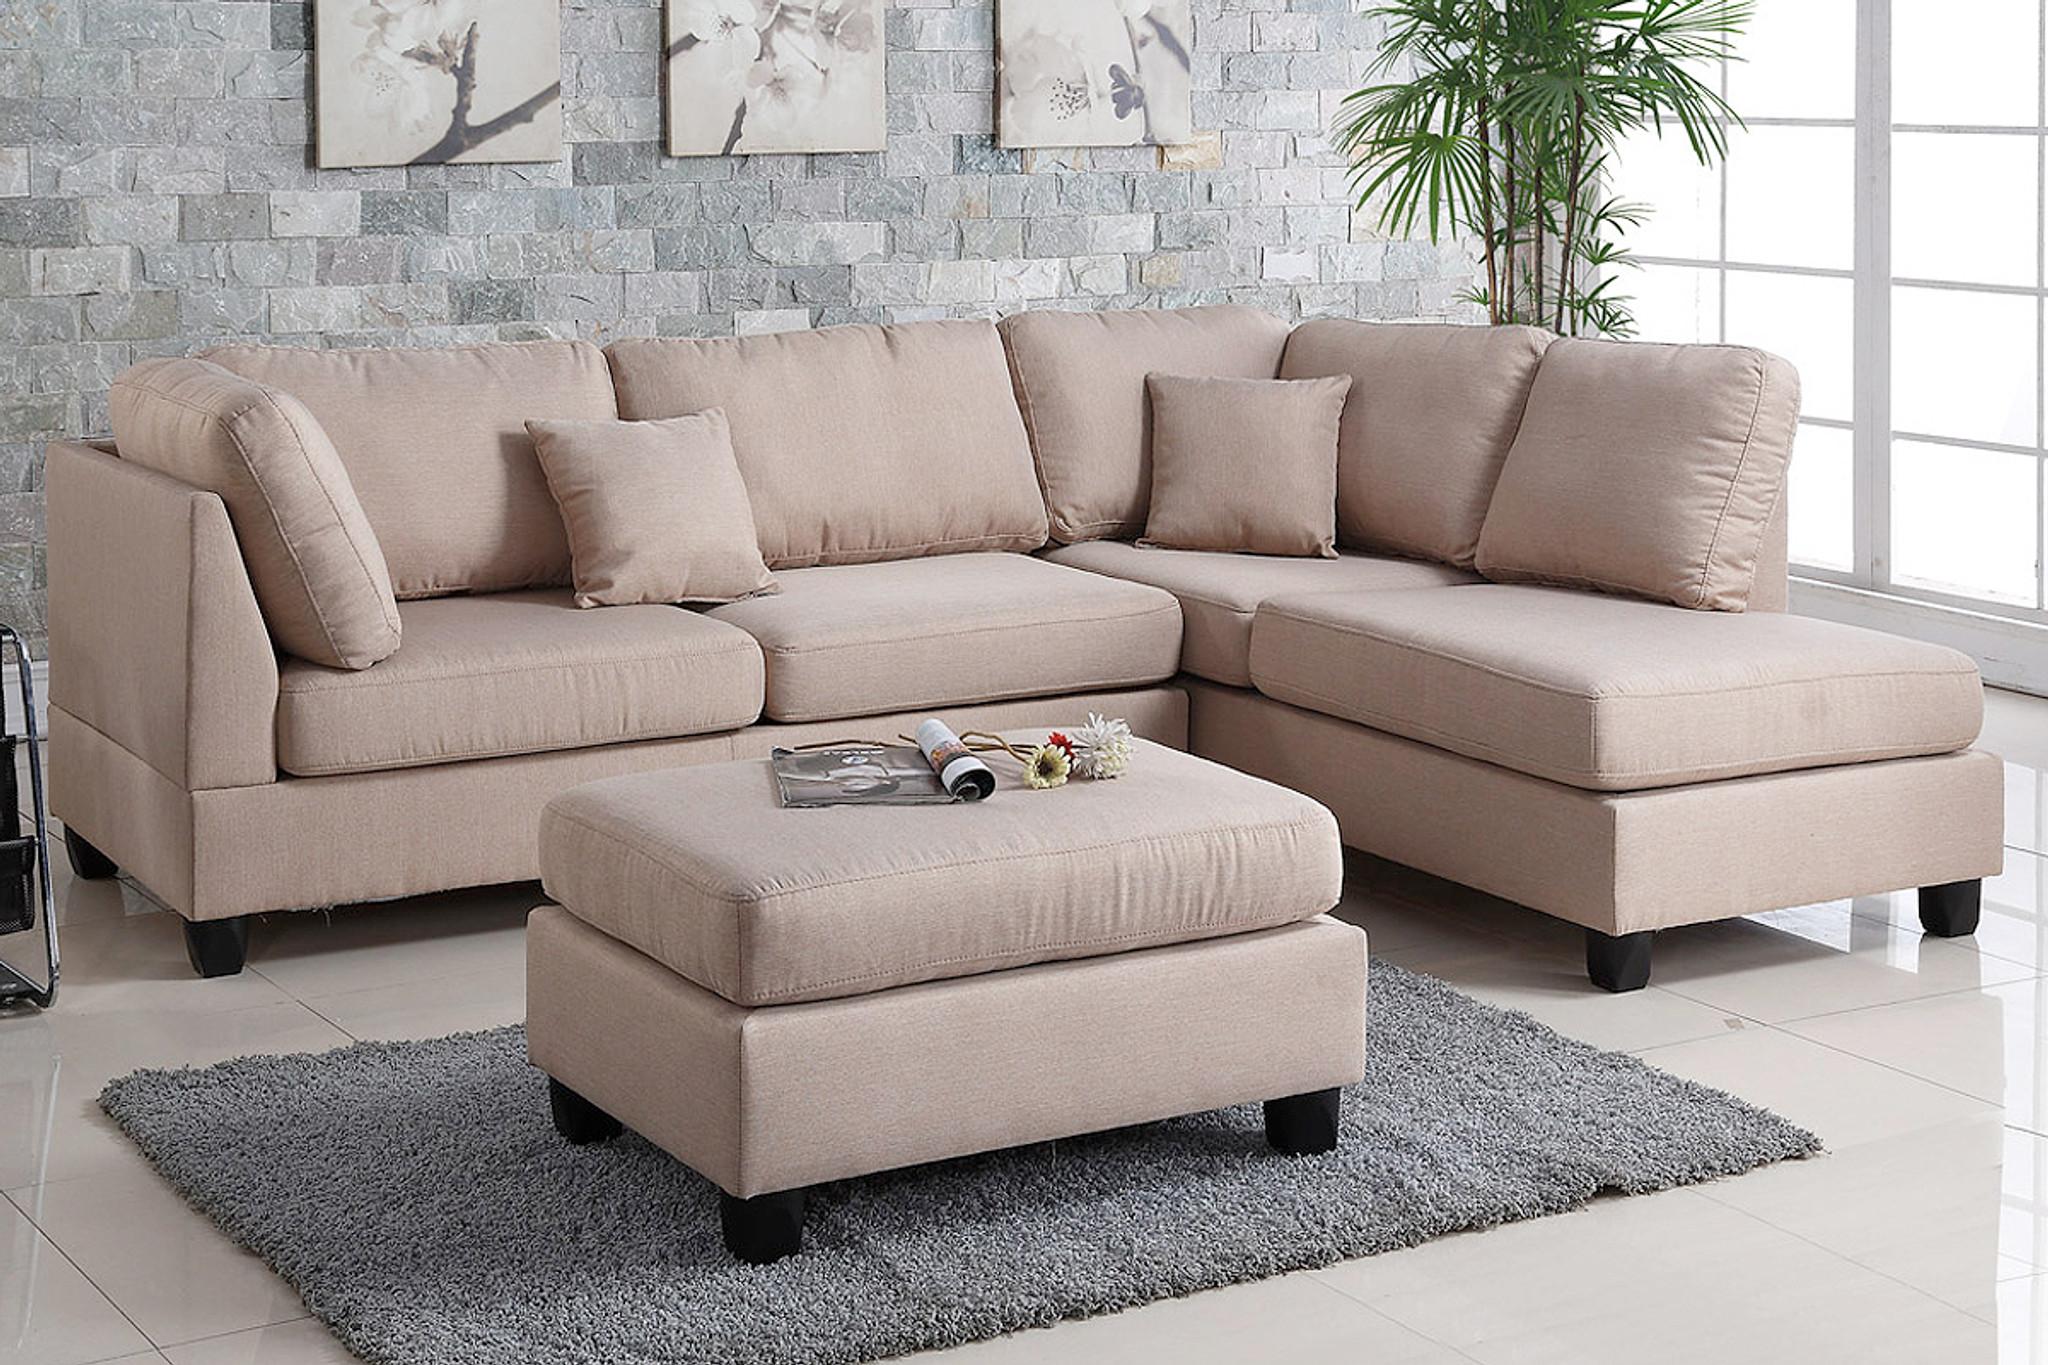 Kassa Mall Home Furniture F7605 Reversible 3 Pcs Sectional Sofa